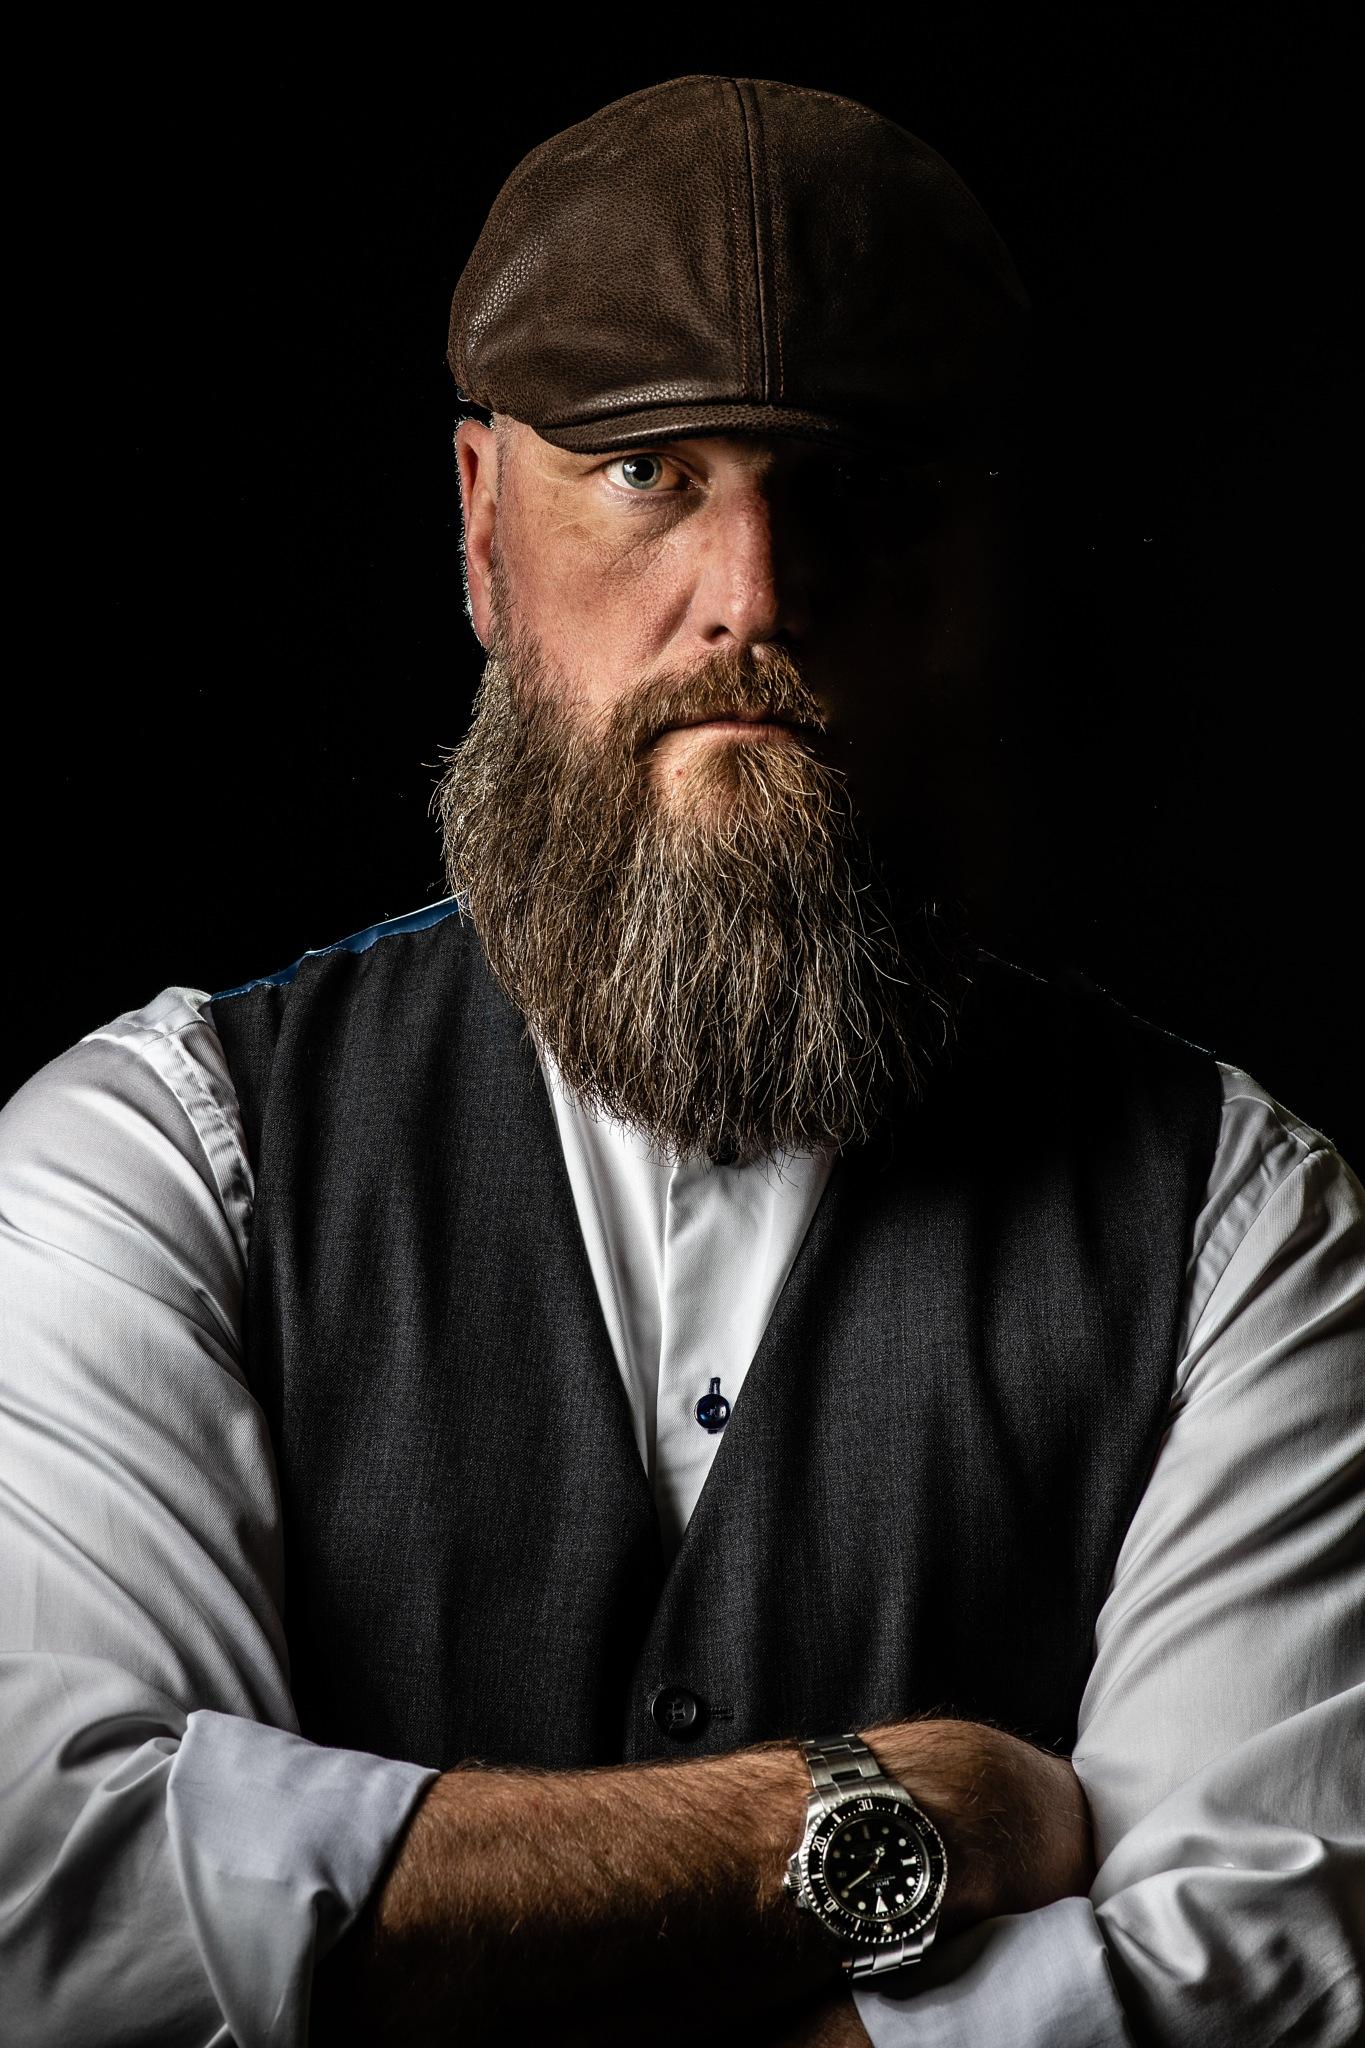 The beard I by ⭐️M W⭐️